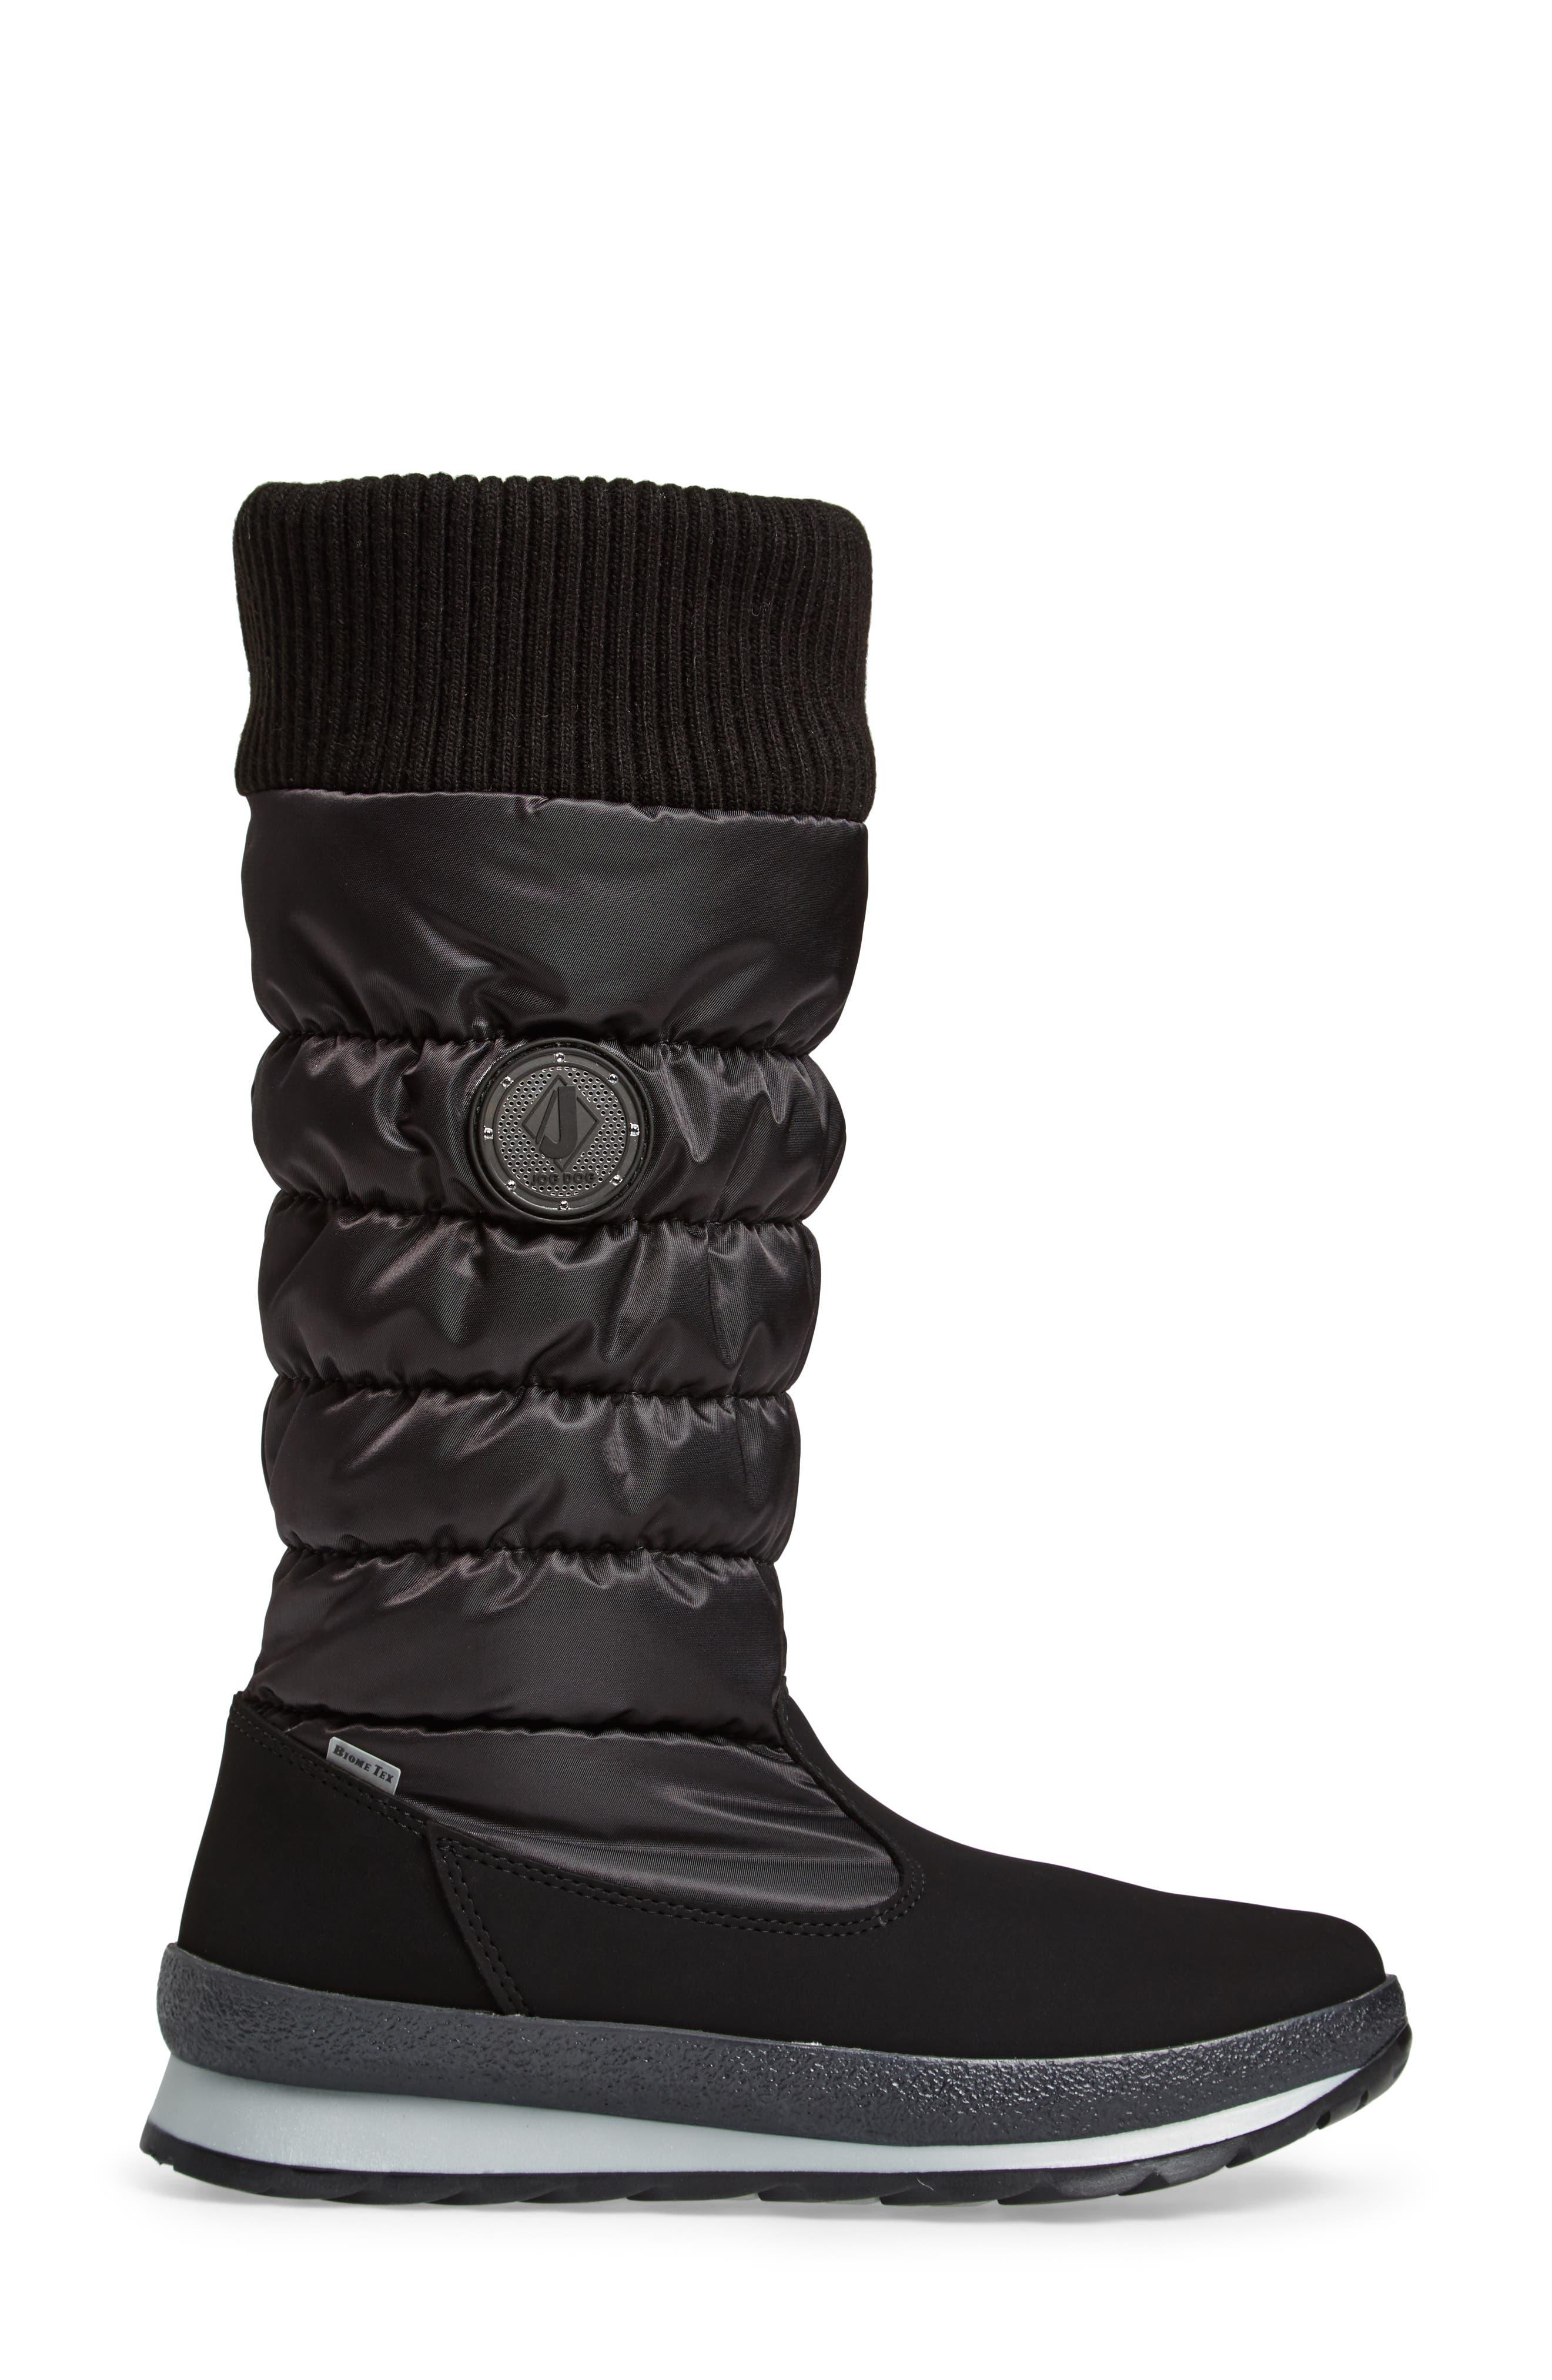 St. Anton Waterproof Winter Boot,                             Alternate thumbnail 3, color,                             BLACK/ ANTHRACITE